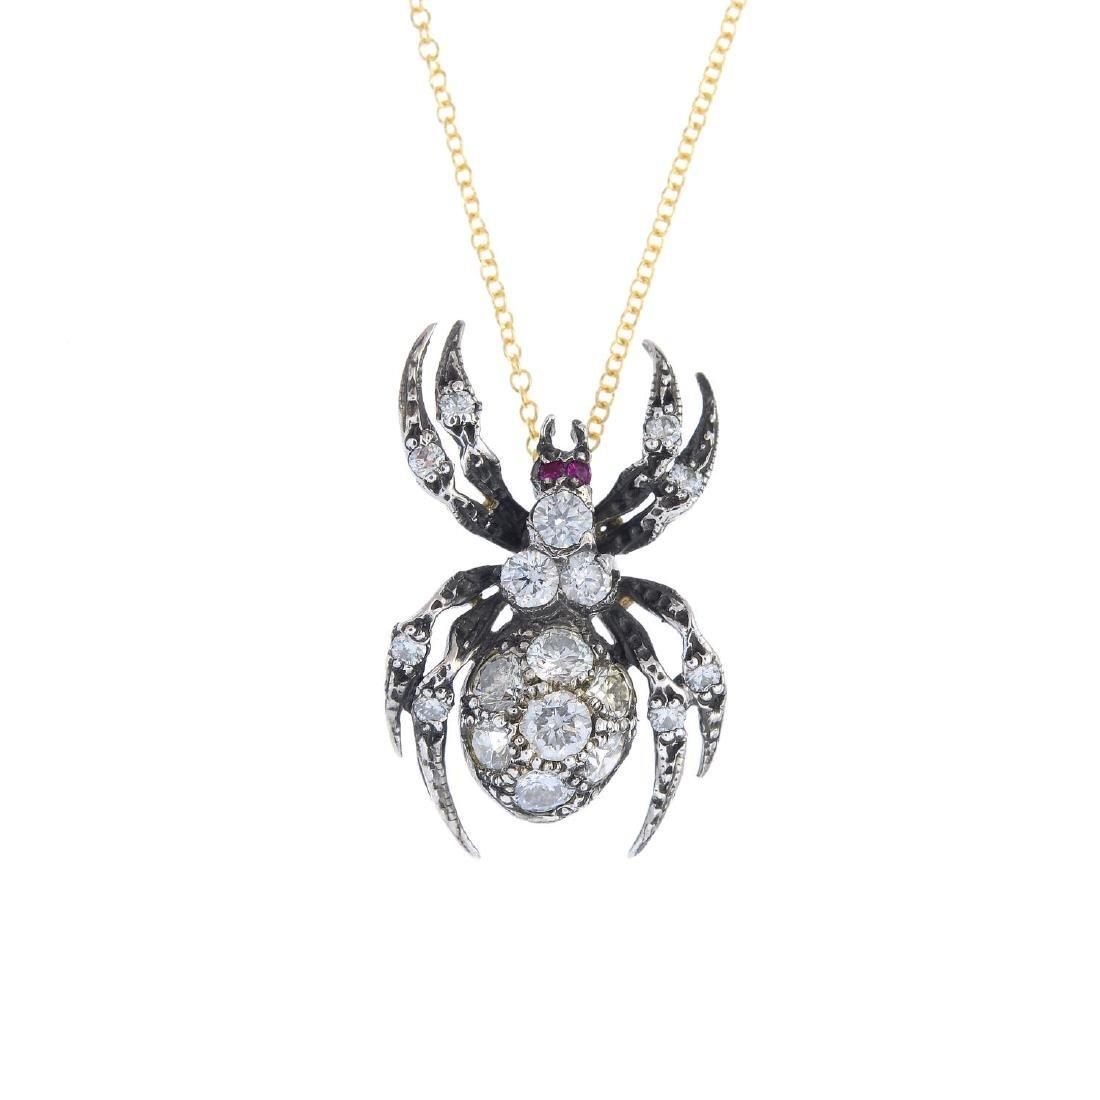 A diamond and ruby spider pendant. The pave-set diamond